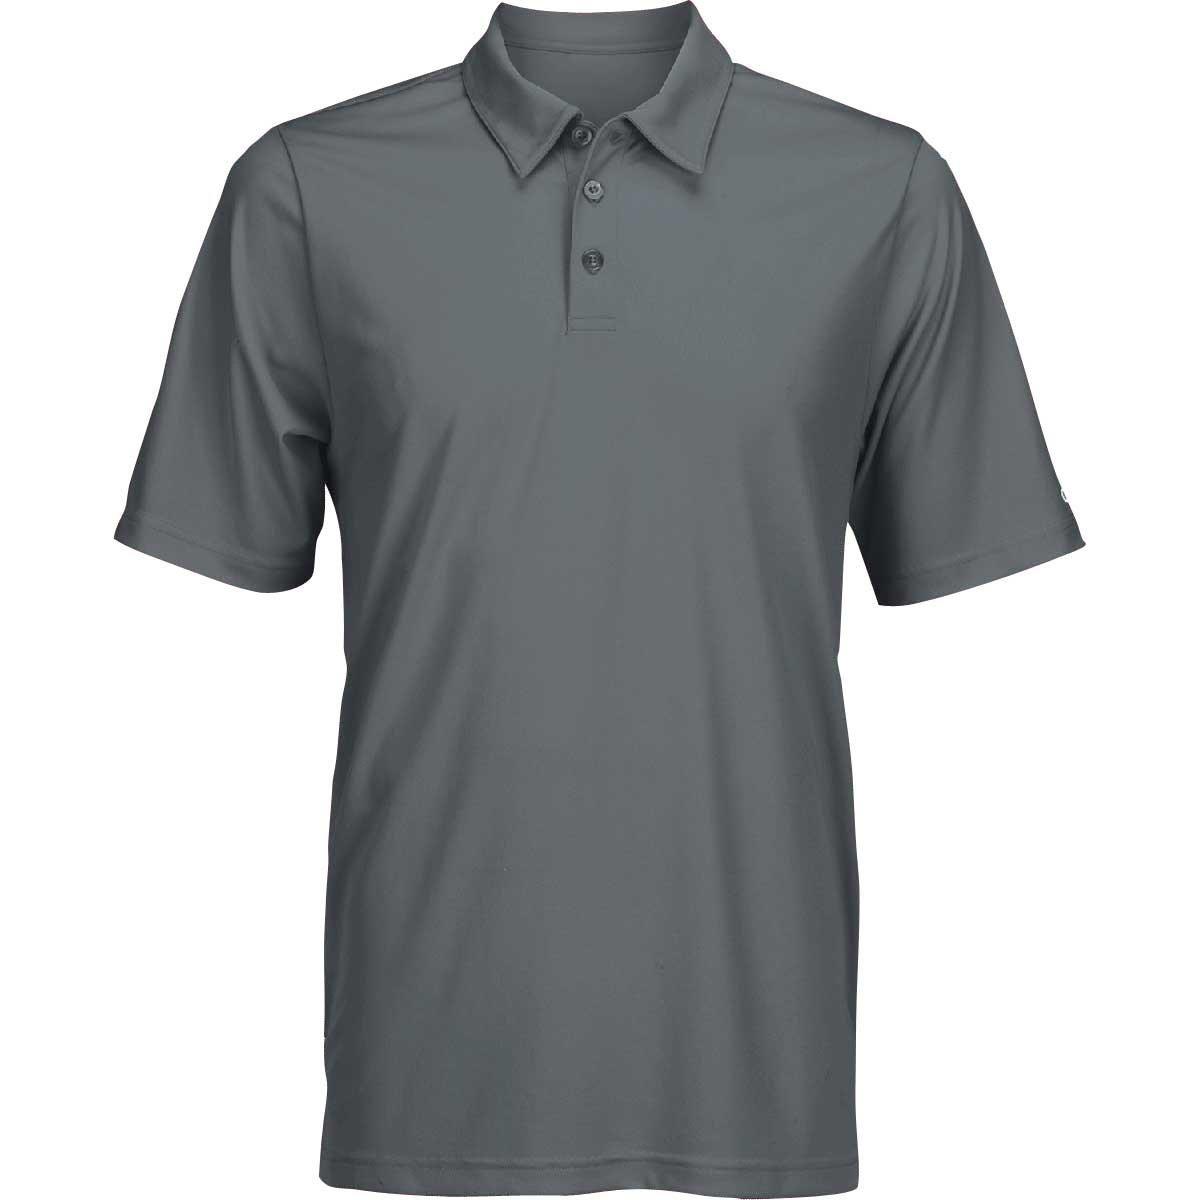 oakley オークレー メンズ basic ポロシャツ b006n0xvne metal sheet